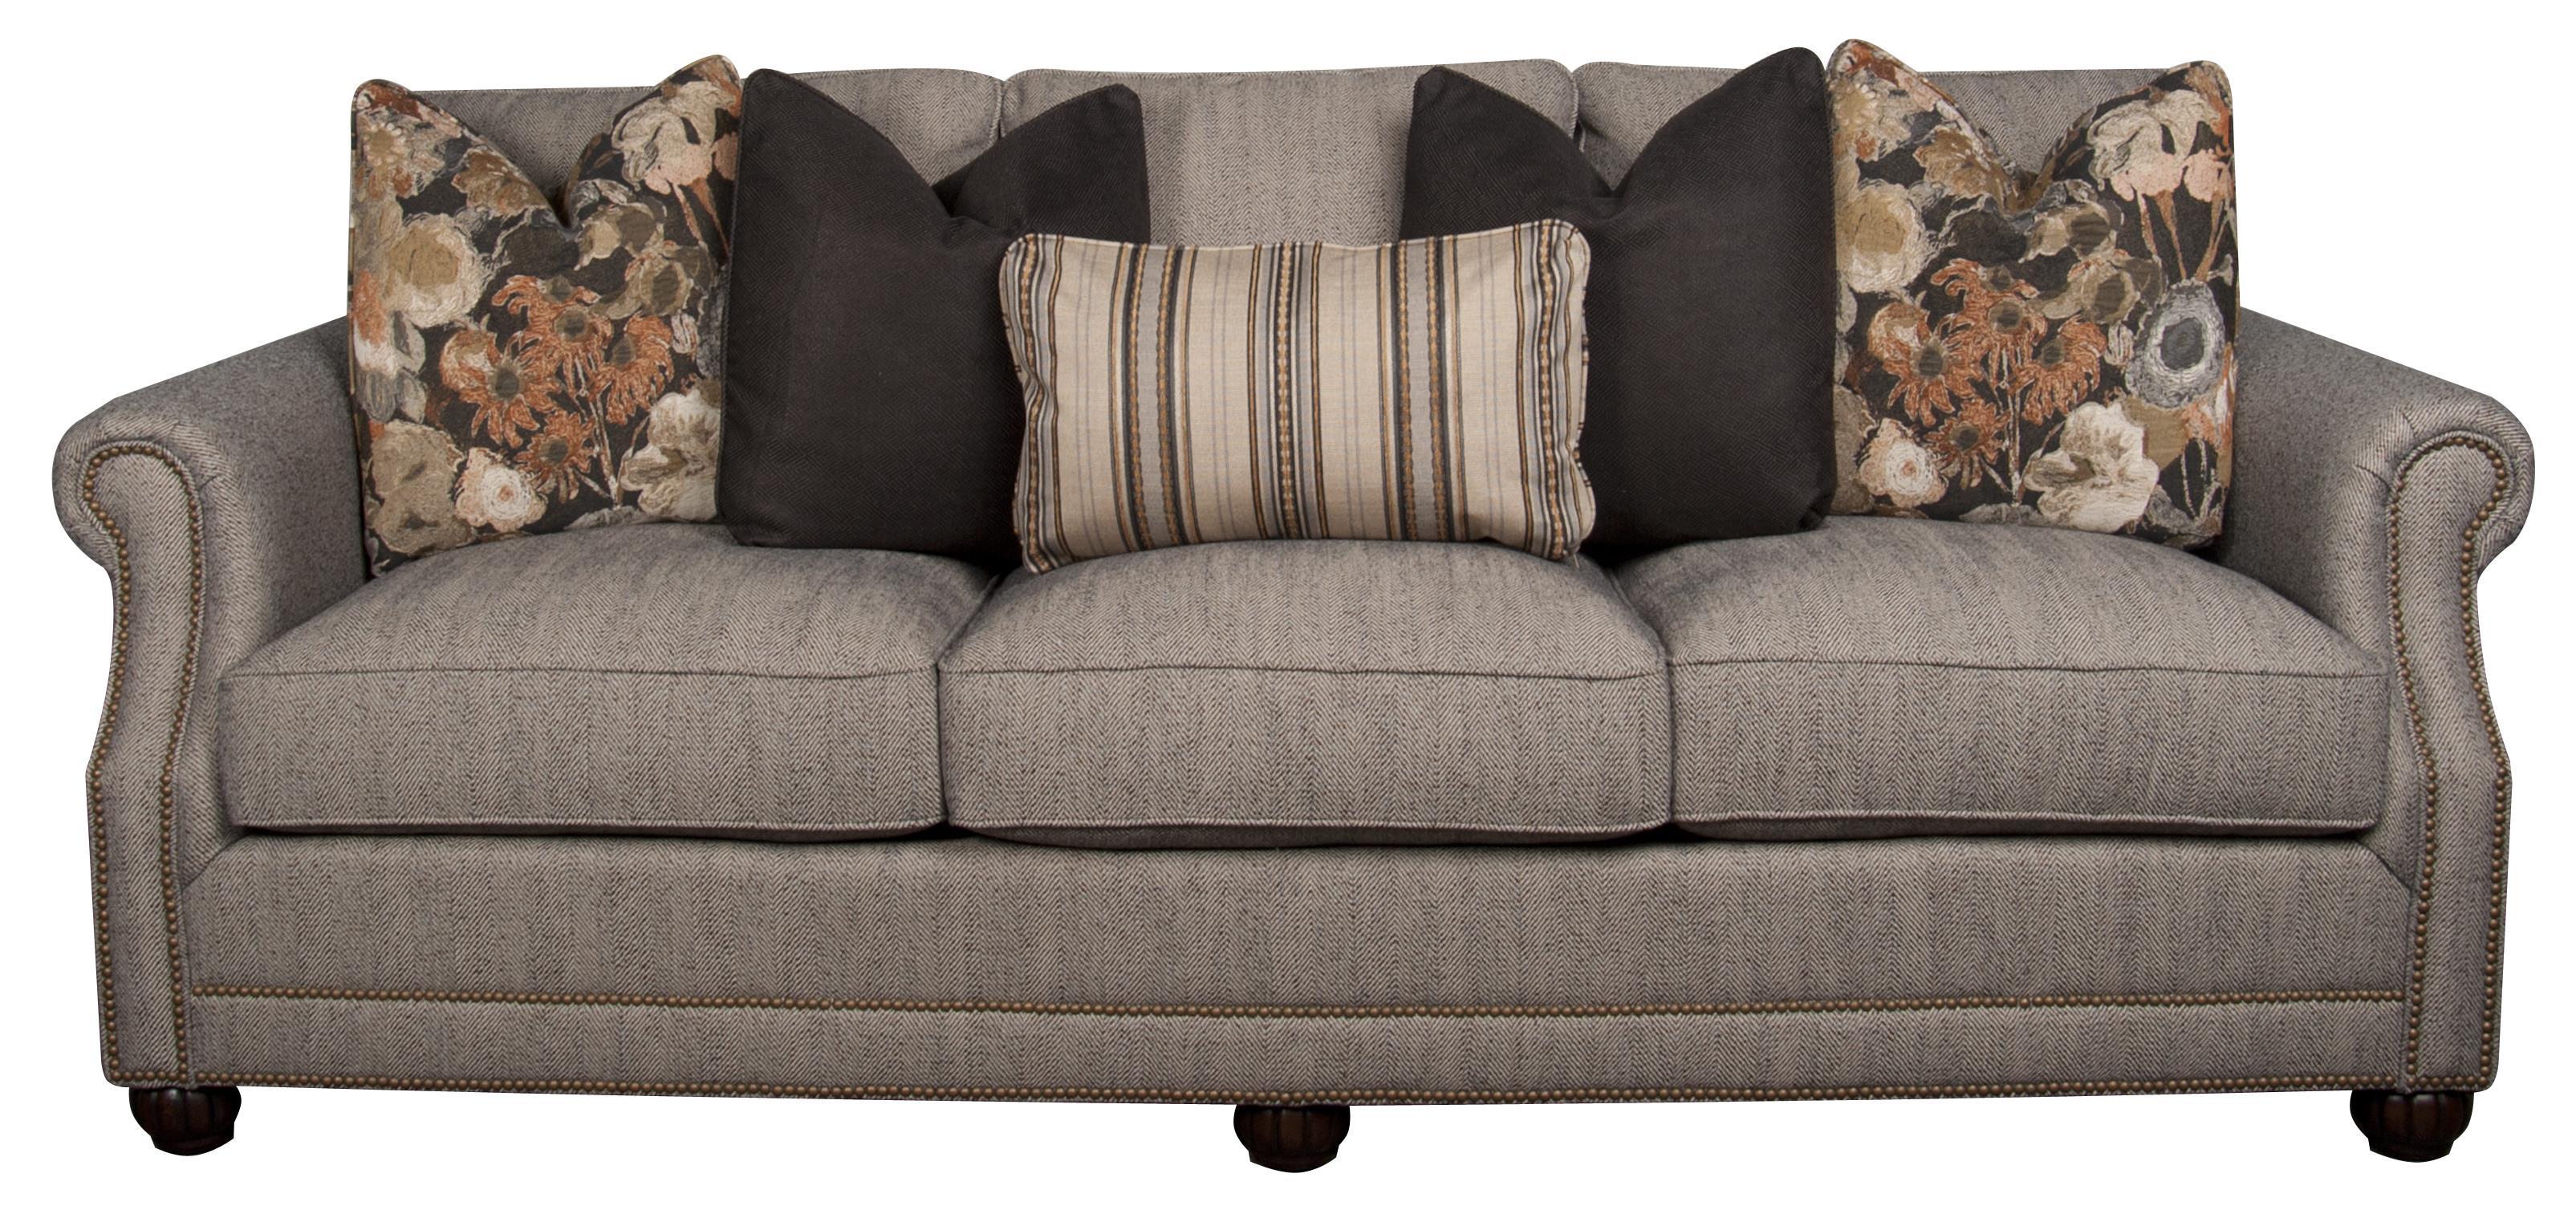 Morris Home Furnishings Sherry Sherry Sofa - Item Number: 251852188